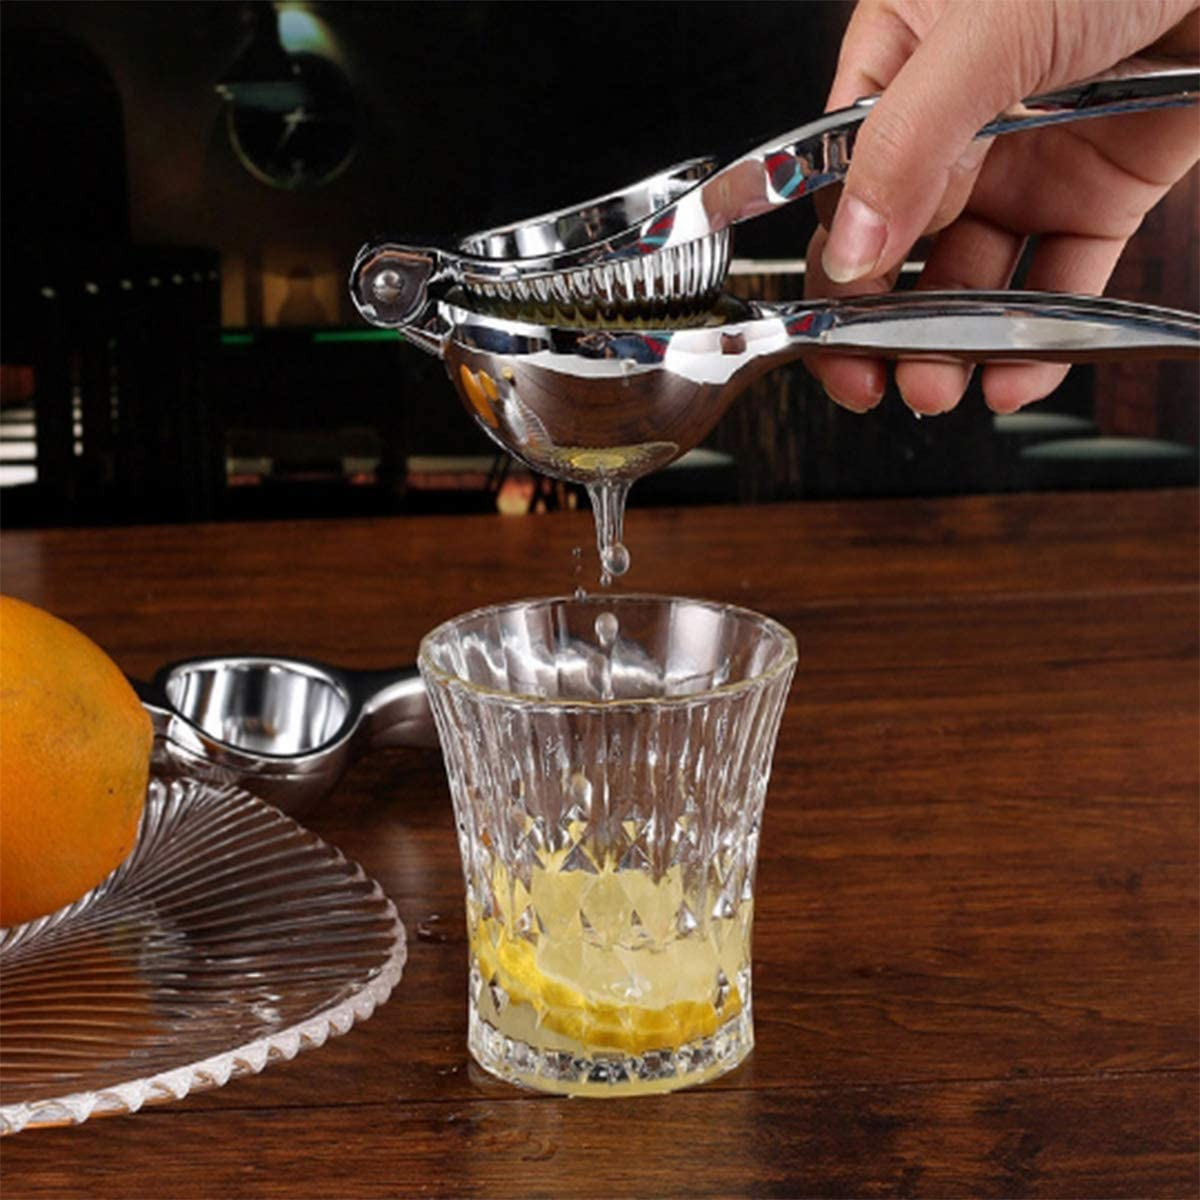 Citrus Juicer Tool Lemon Juicer Squeezer Hand-squeezing Citrus Lemon Clip Hand Manual Lemon Squeezers-lime Metal Squeezer Power Professional Lemon Squeezer Hmtoperyd Lemon Squeezer Lime